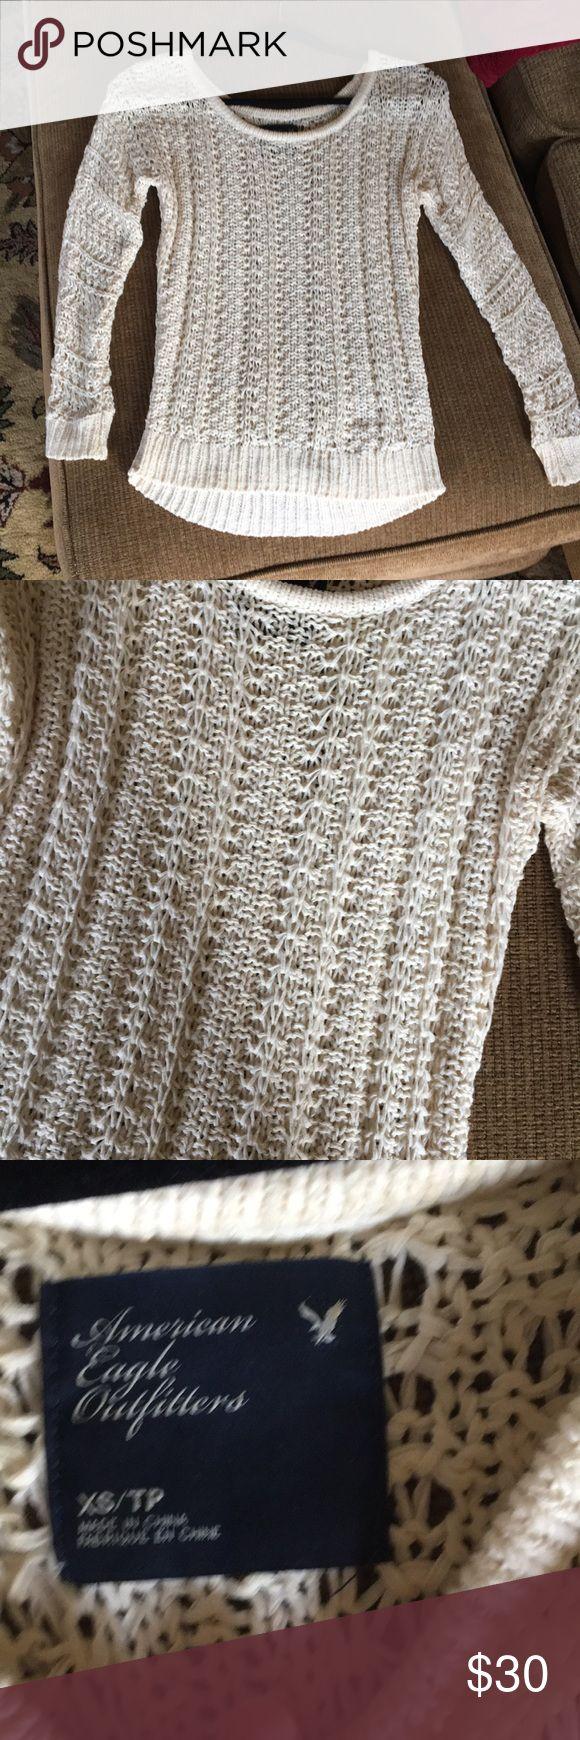 American eagle cream sweater XS cream sweater American Eagle Outfitters Sweaters Crew & Scoop Necks